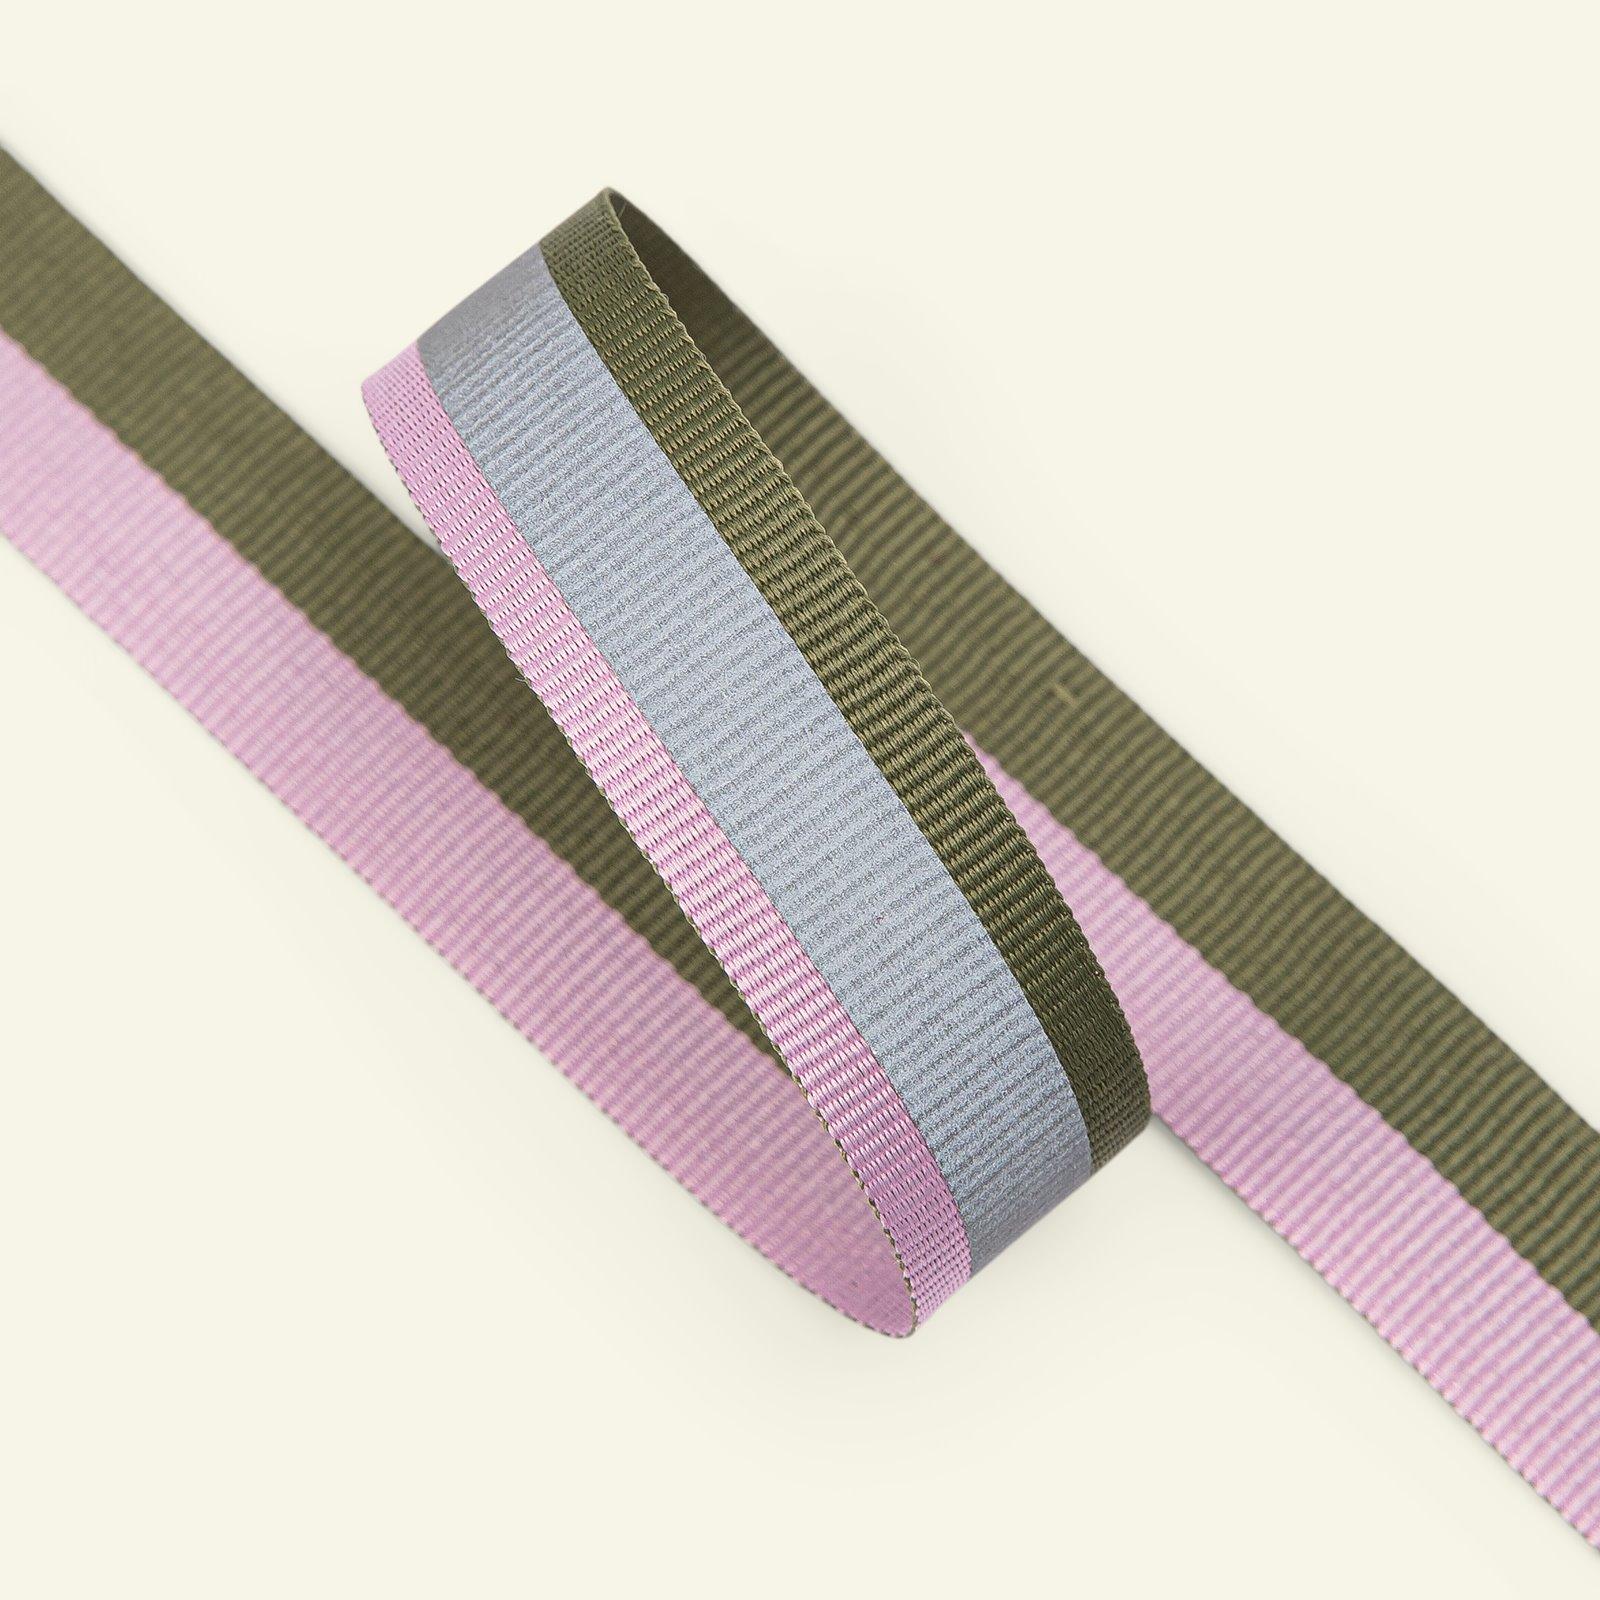 Band, Reflexeffekt 20mm Violett/Lime, 2m 22200_pack